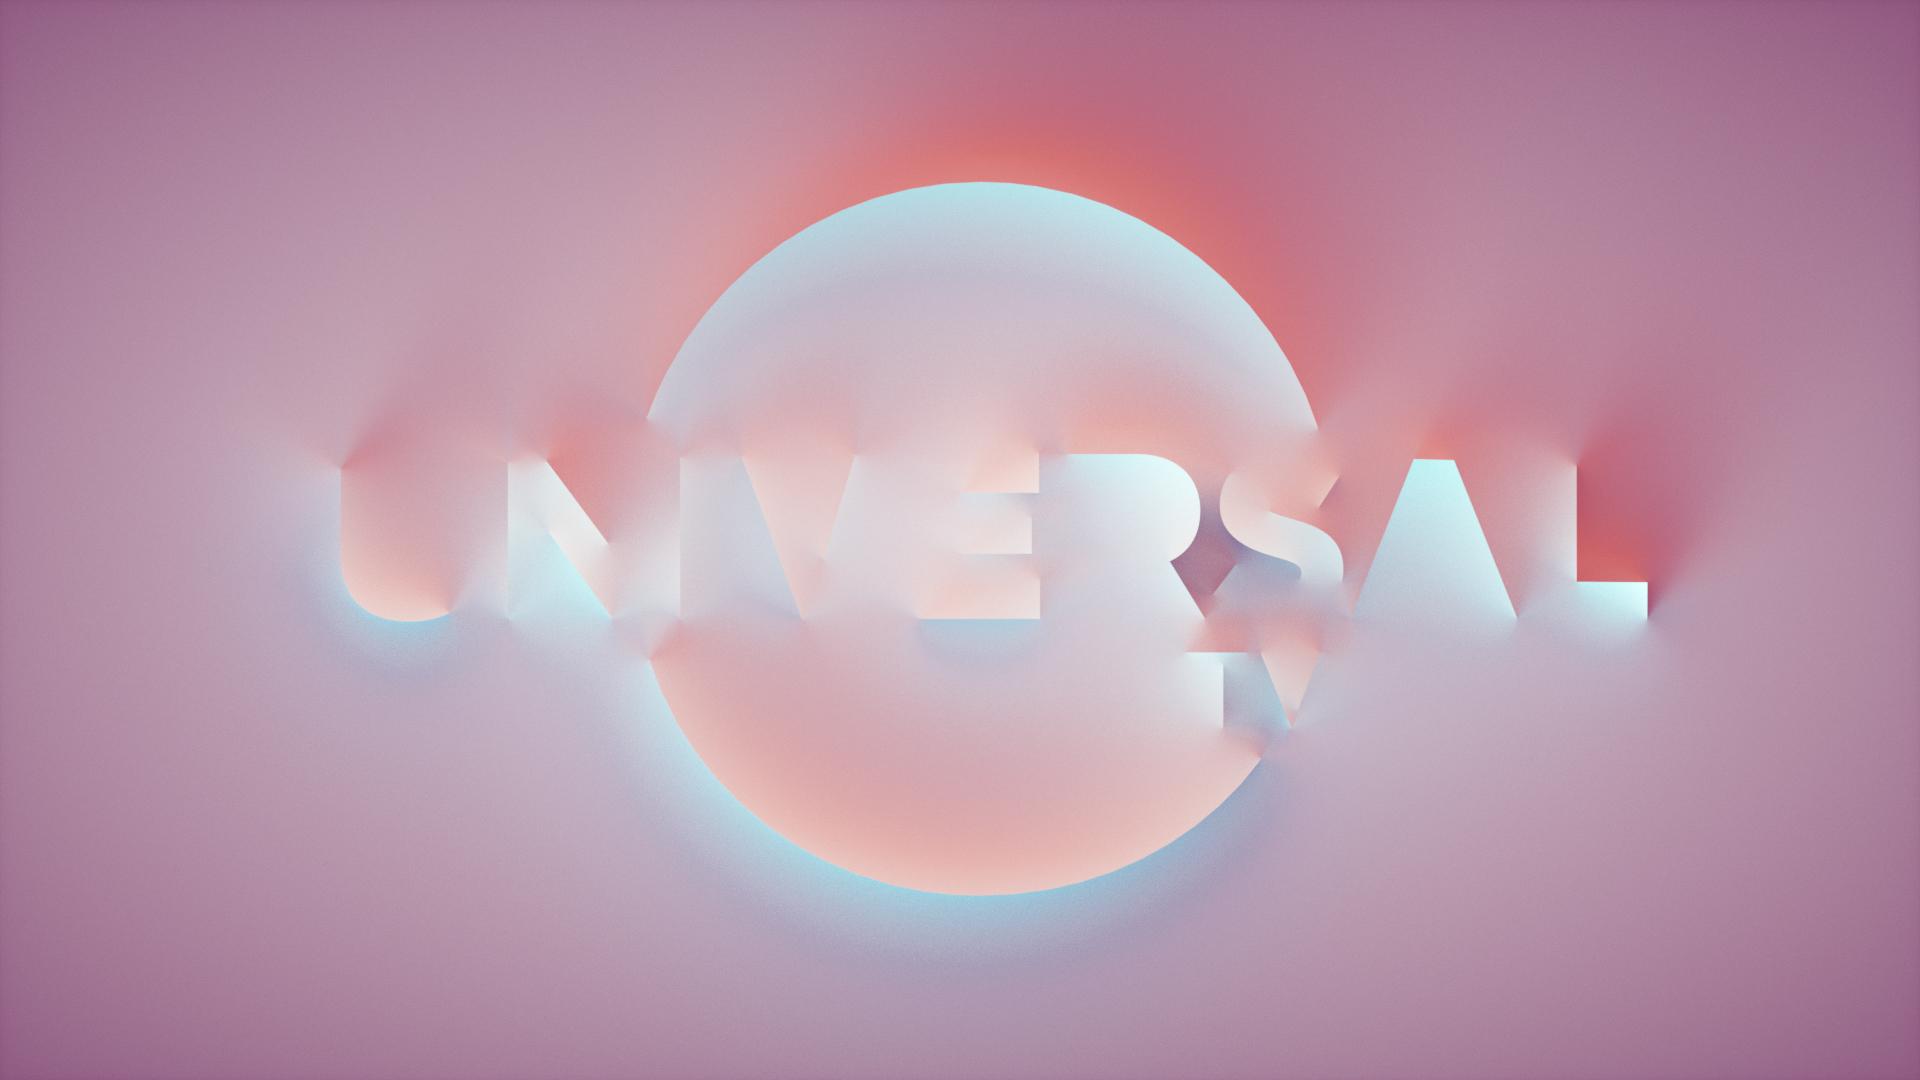 UNIVERSAL_RND_8